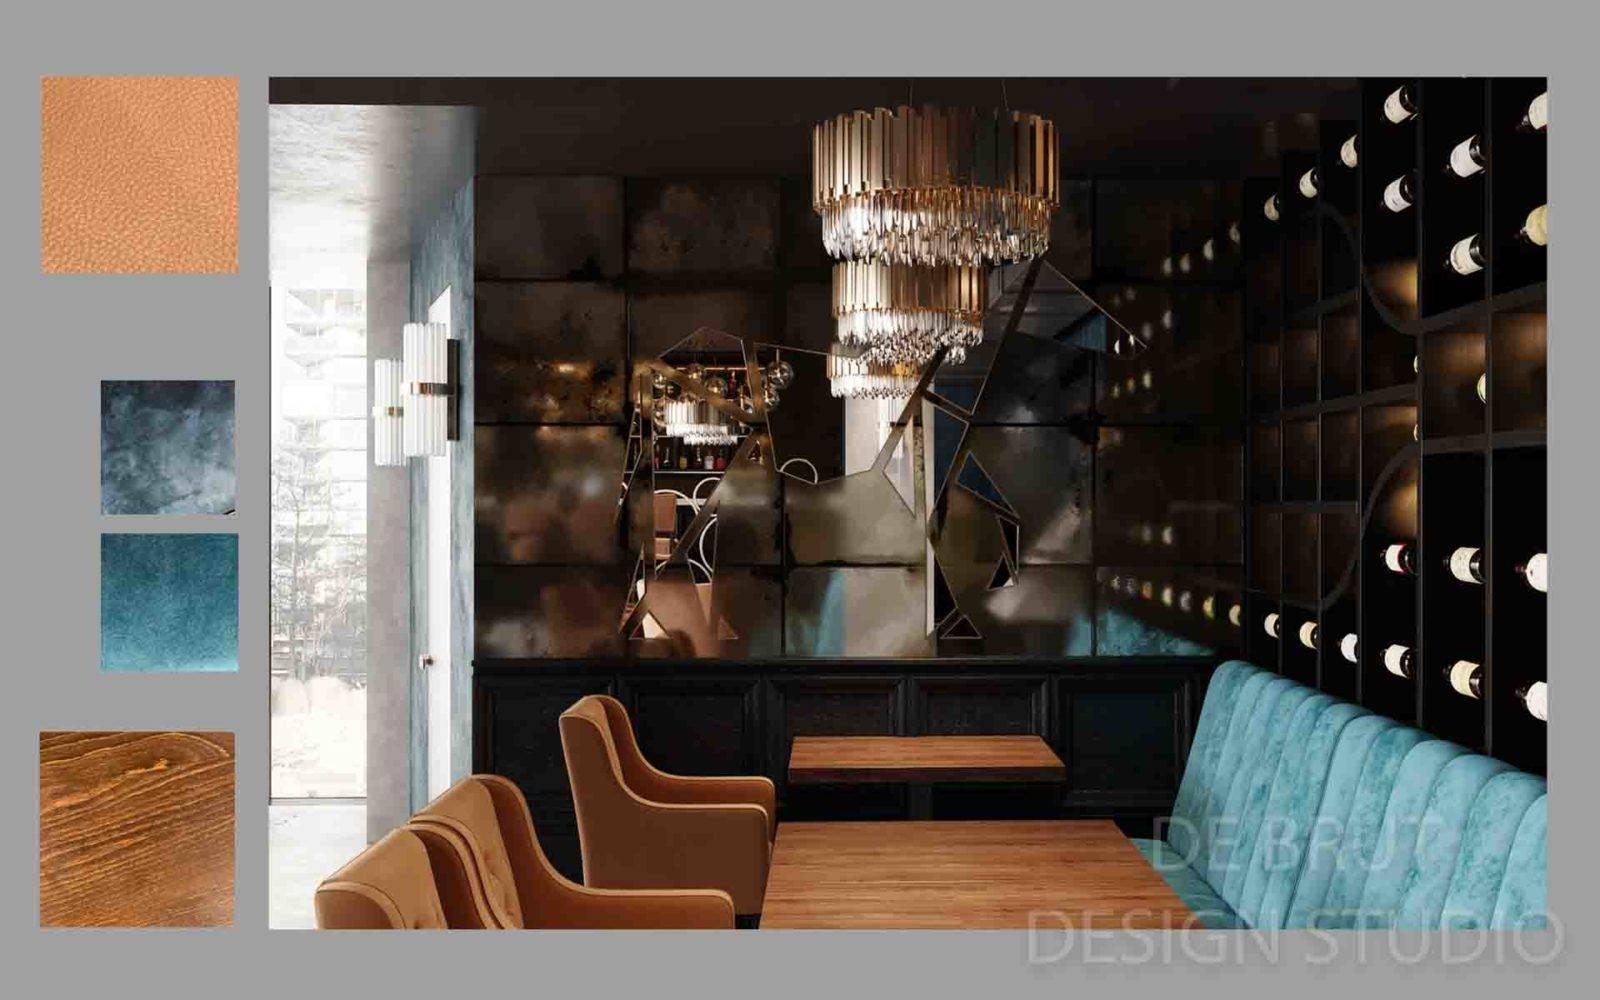 design interieru praha alex brut studio richman bussines bar 9 1 - Design interiéru restaurace Richman